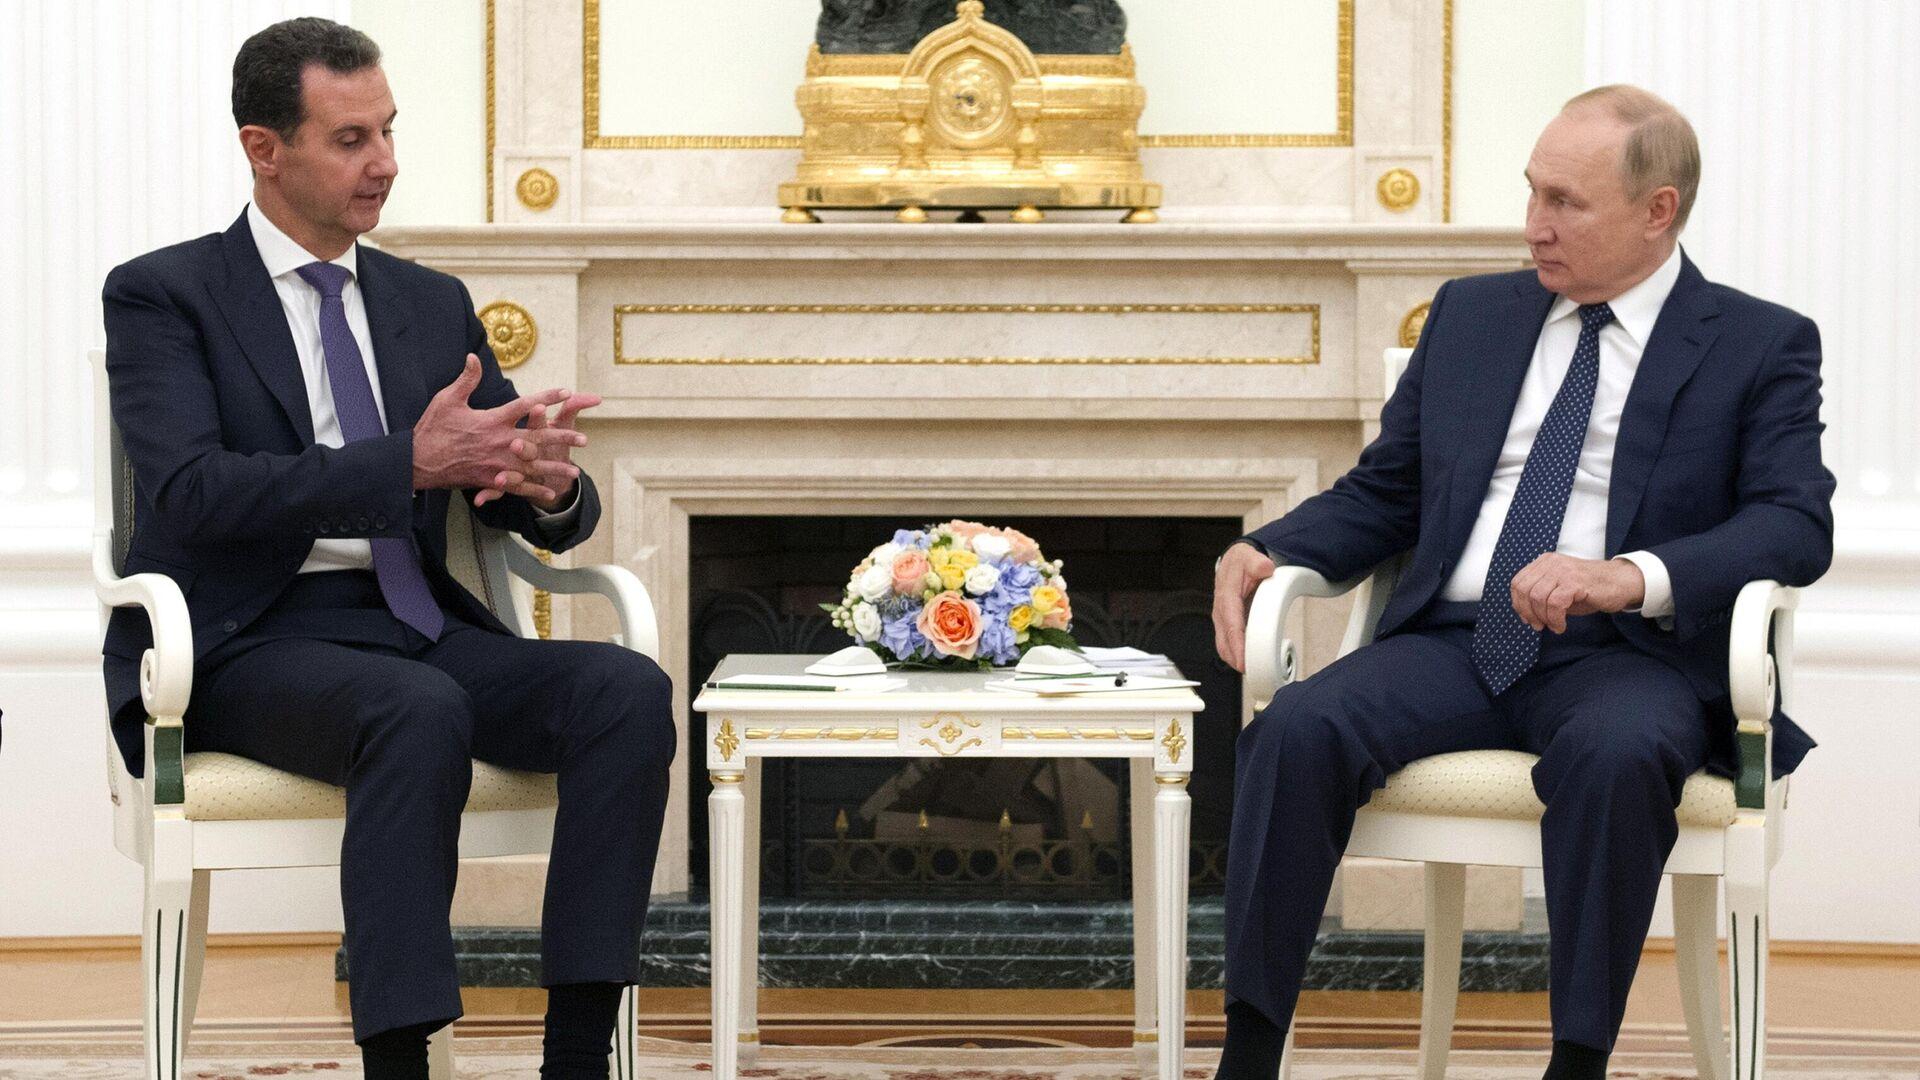 Bashar Asad, presidente de Siria, y Vladímir Putin, presidente de Rusia - Sputnik Mundo, 1920, 14.09.2021